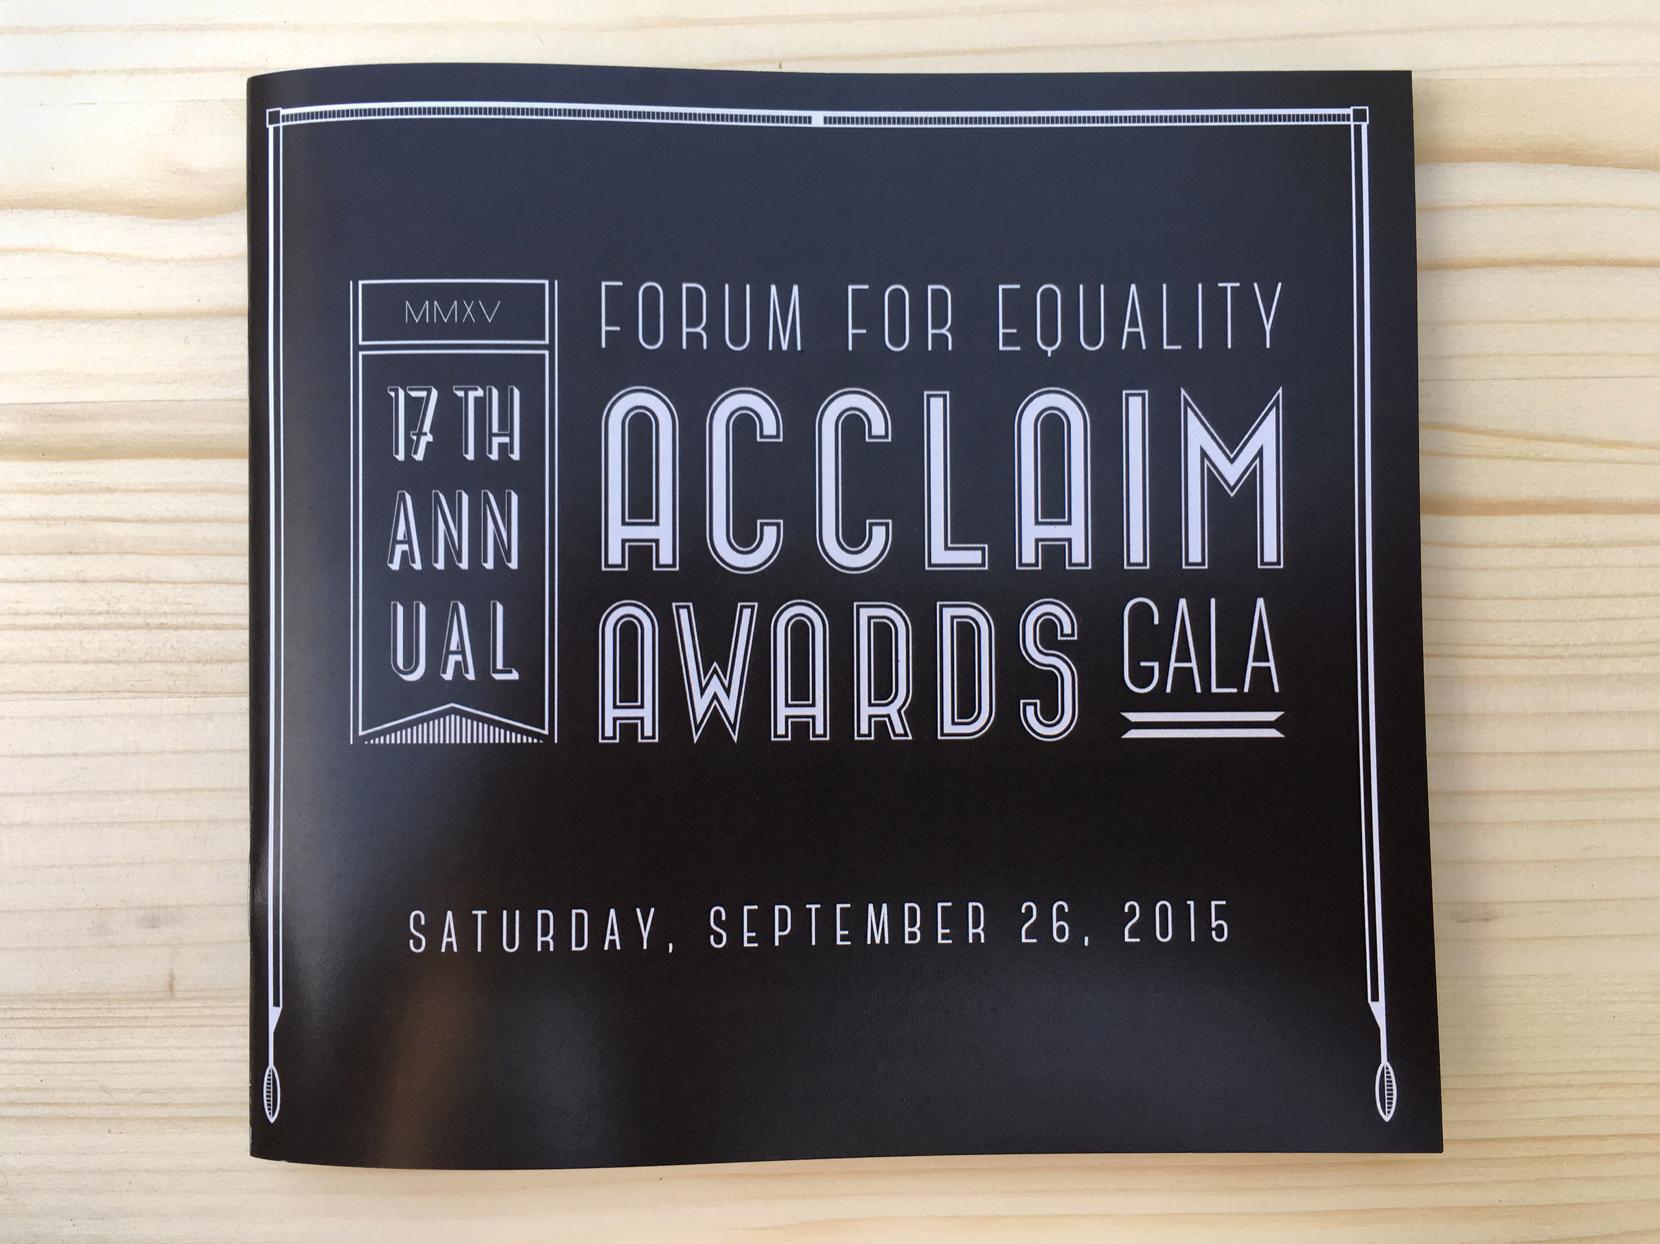 2015 Forum for Equality Acclaim Awards